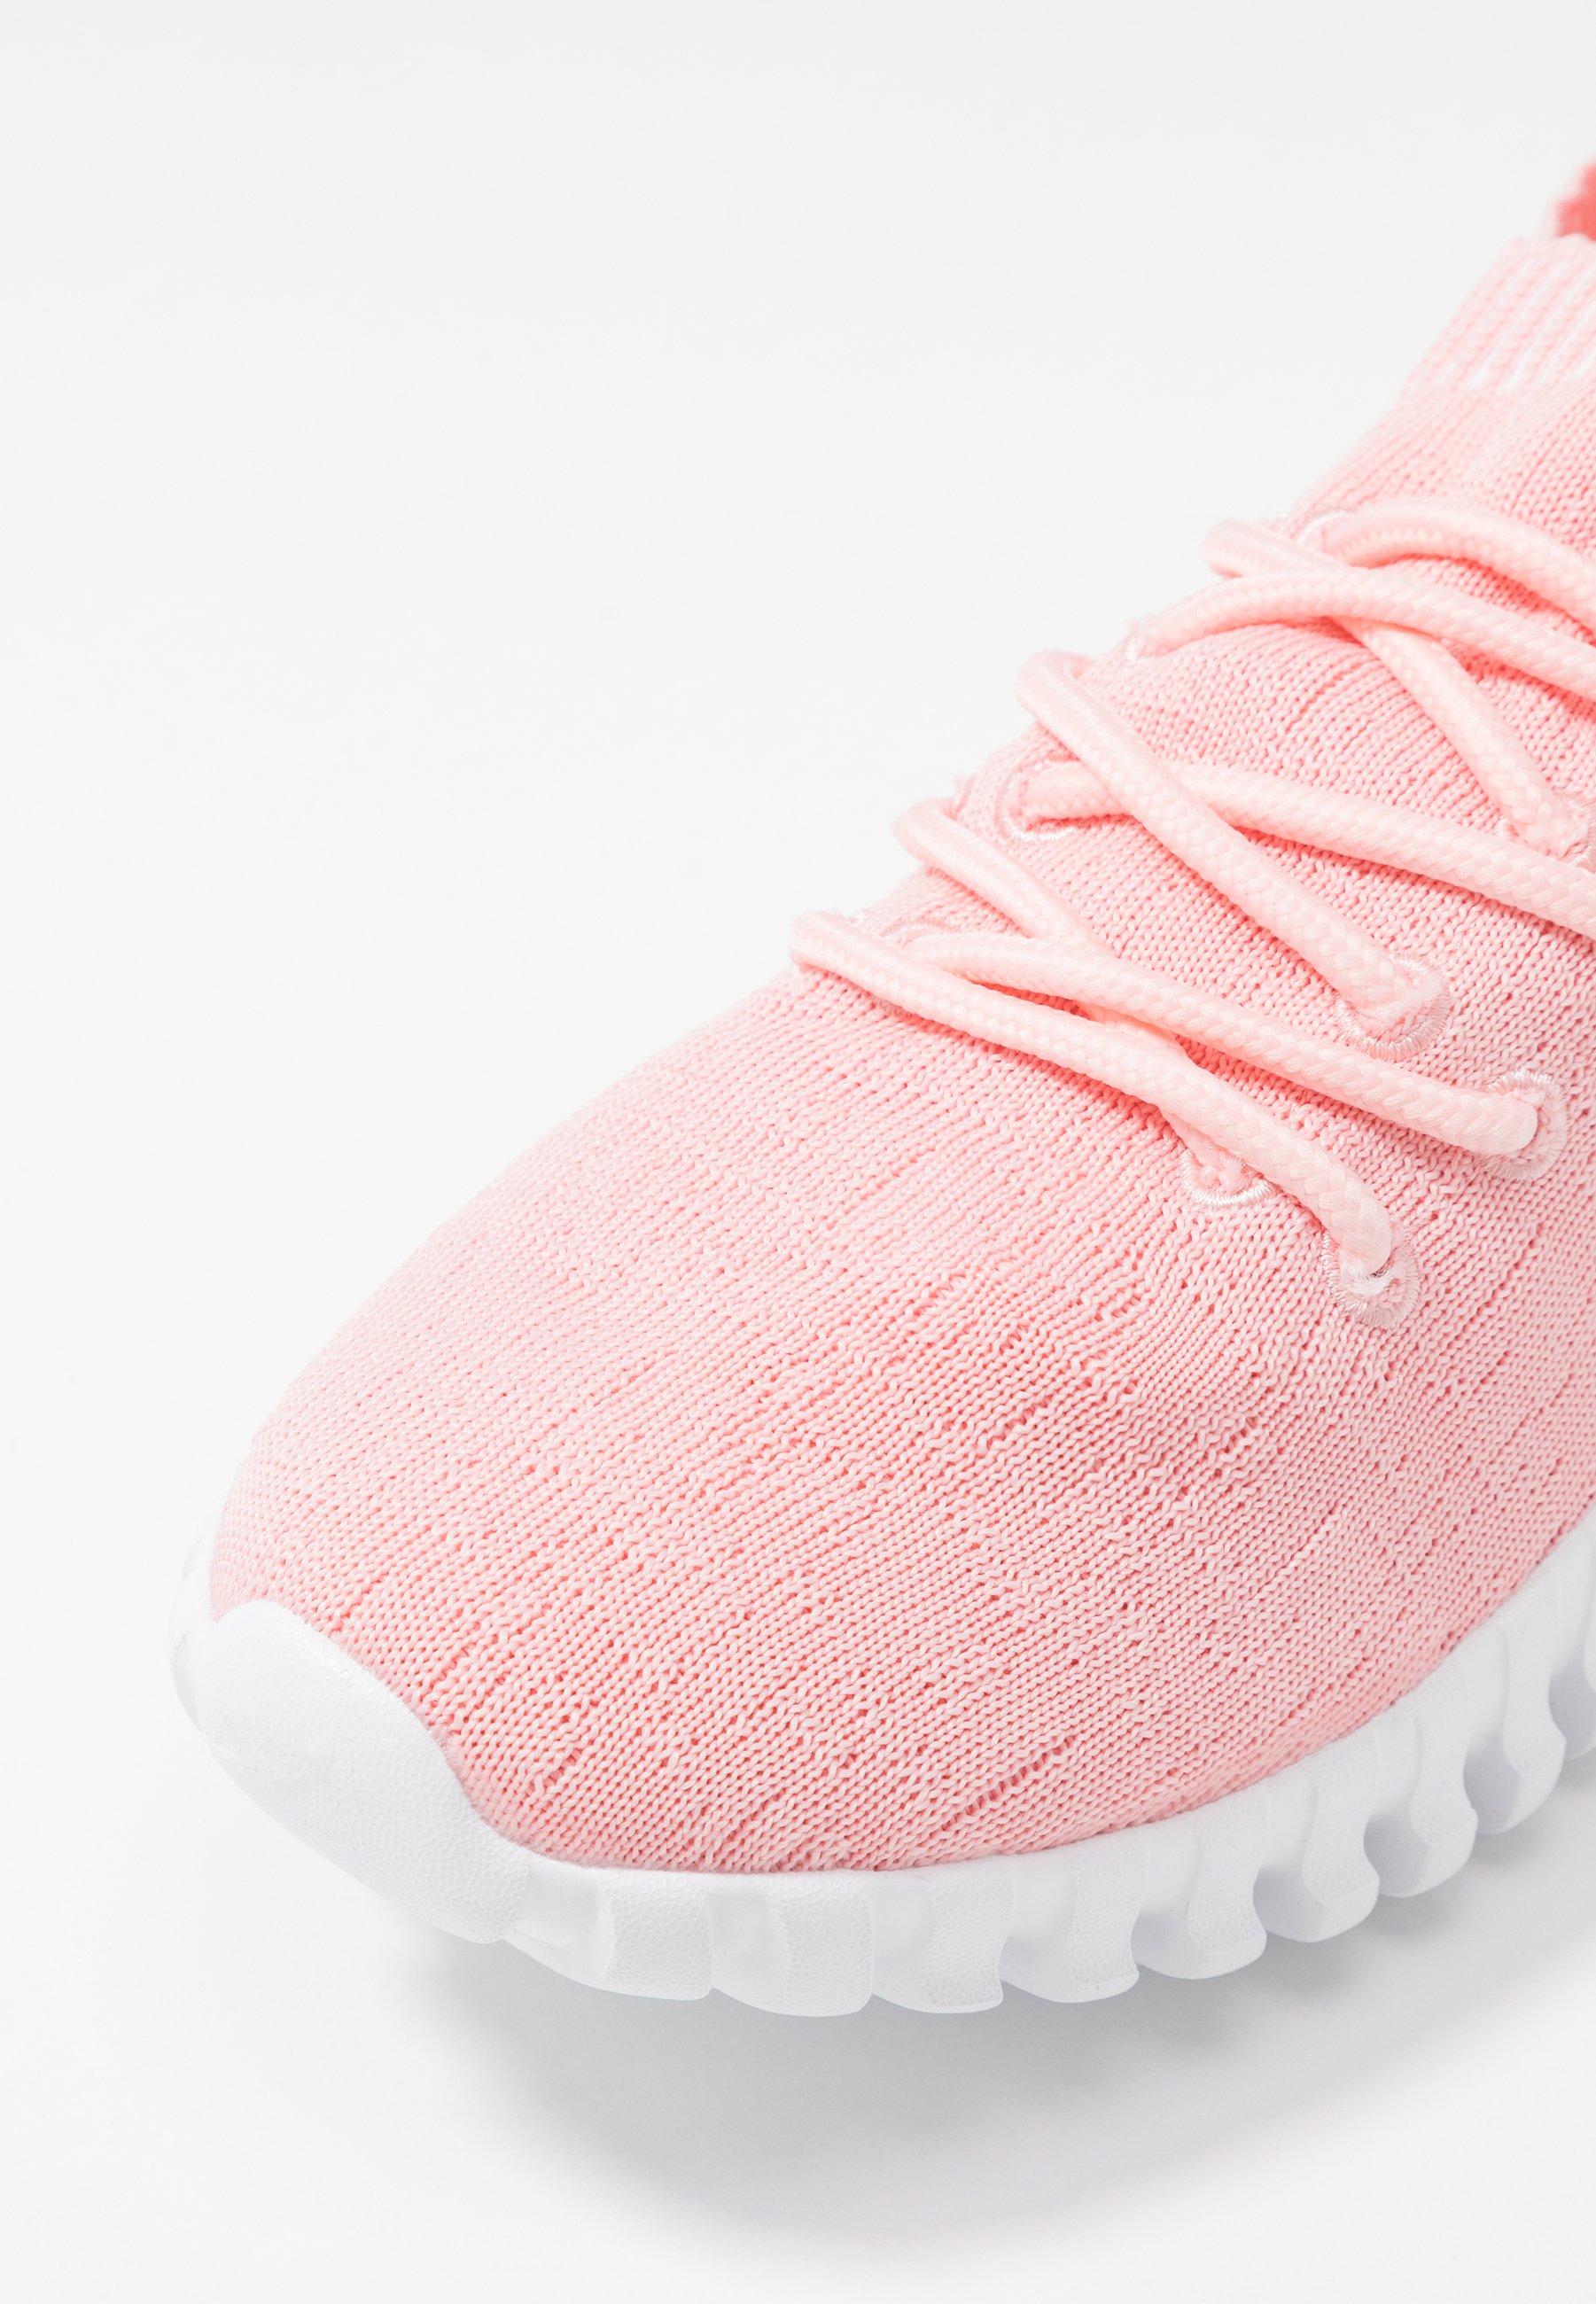 Bernie Mev Gravity - Sneakers Basse Blush haFOq